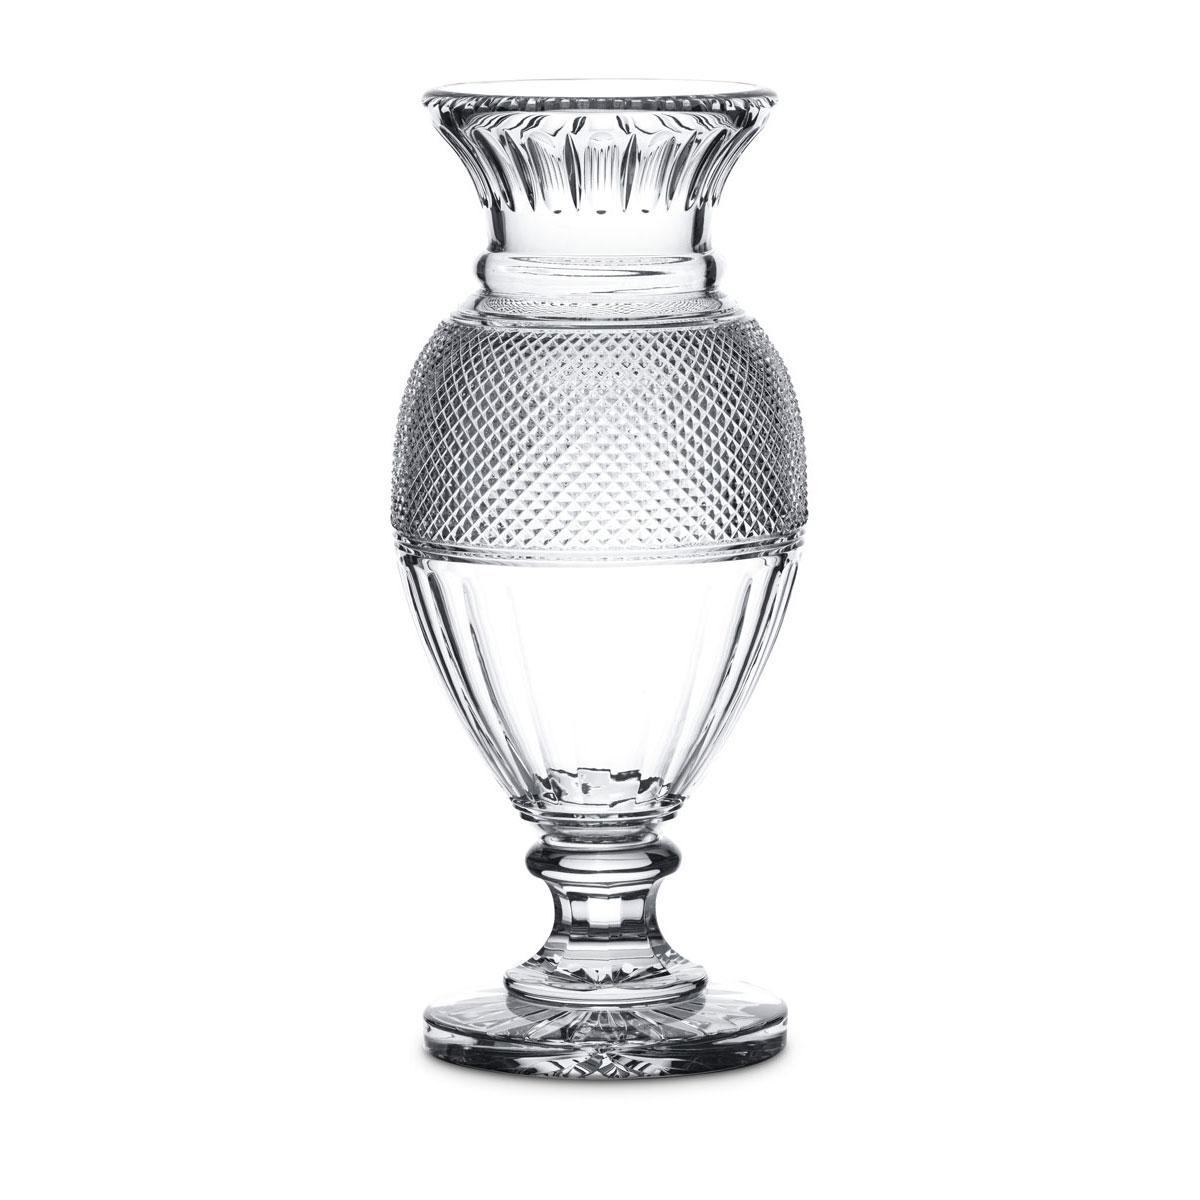 "Baccarat Crystal, Diamant Balluster 19 5/8"" Crystal Vase"